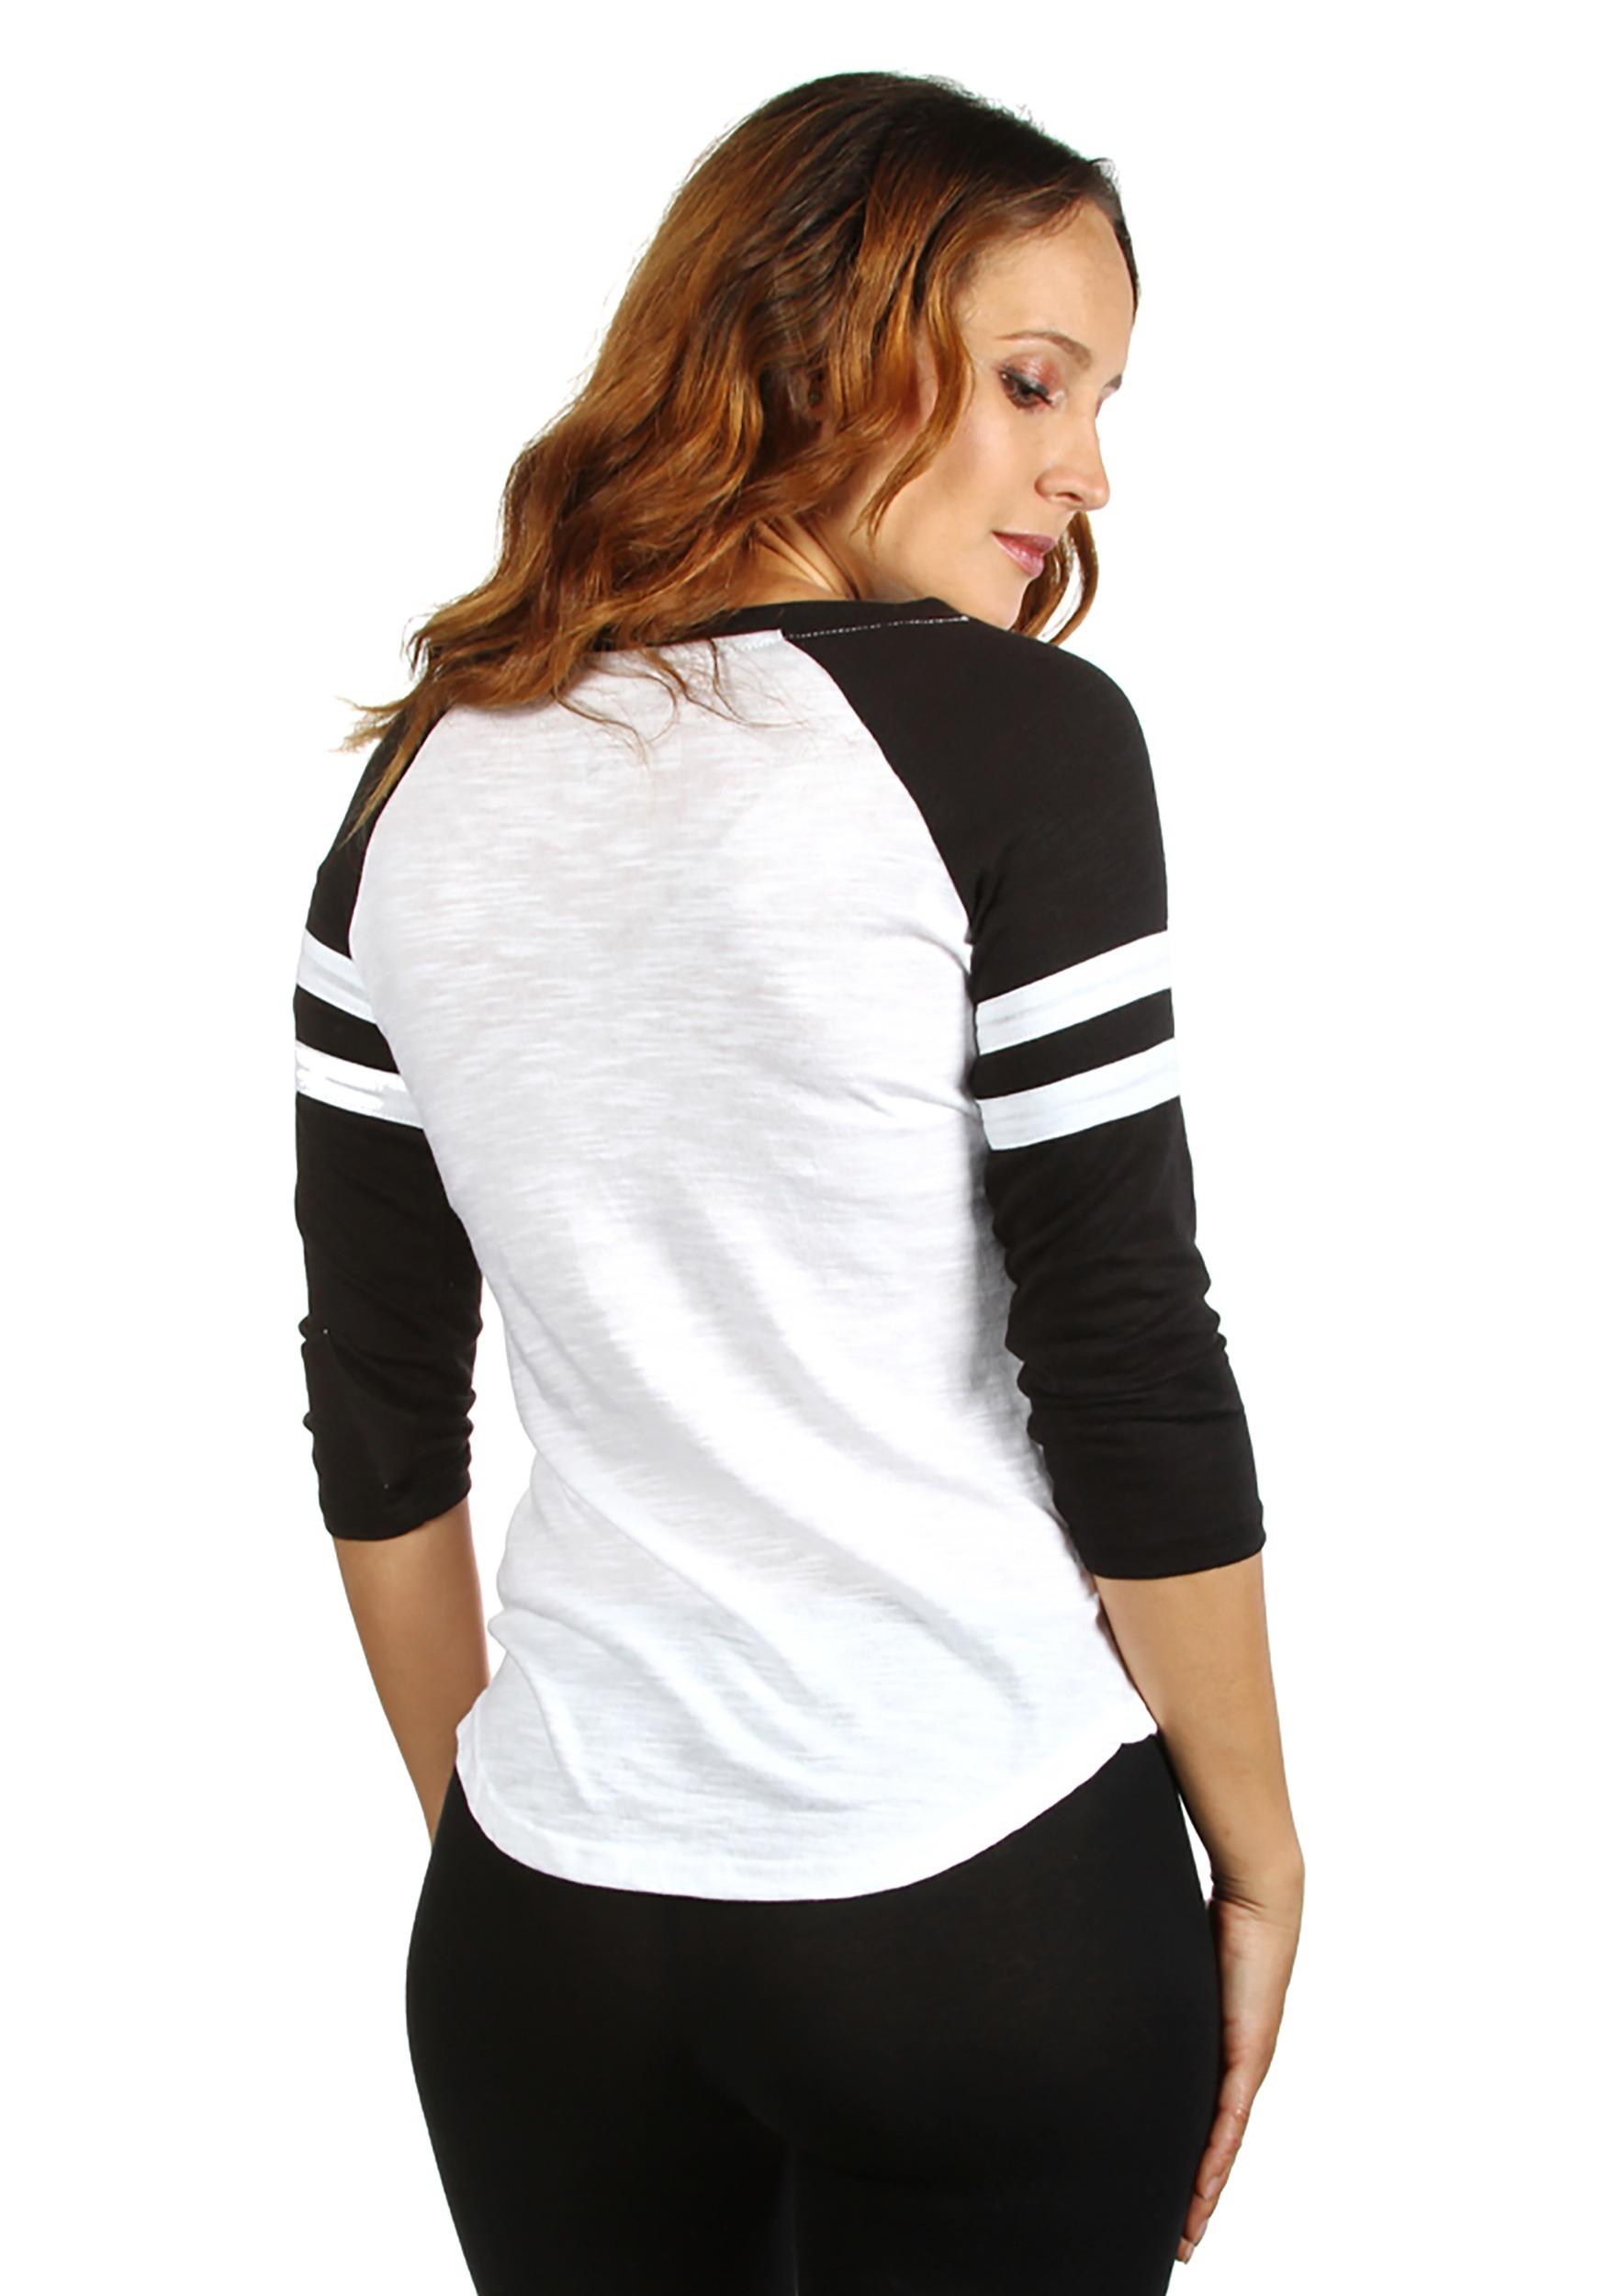 810a15f3177 Womens AC DC Fashion Black White Raglan Shirt Back